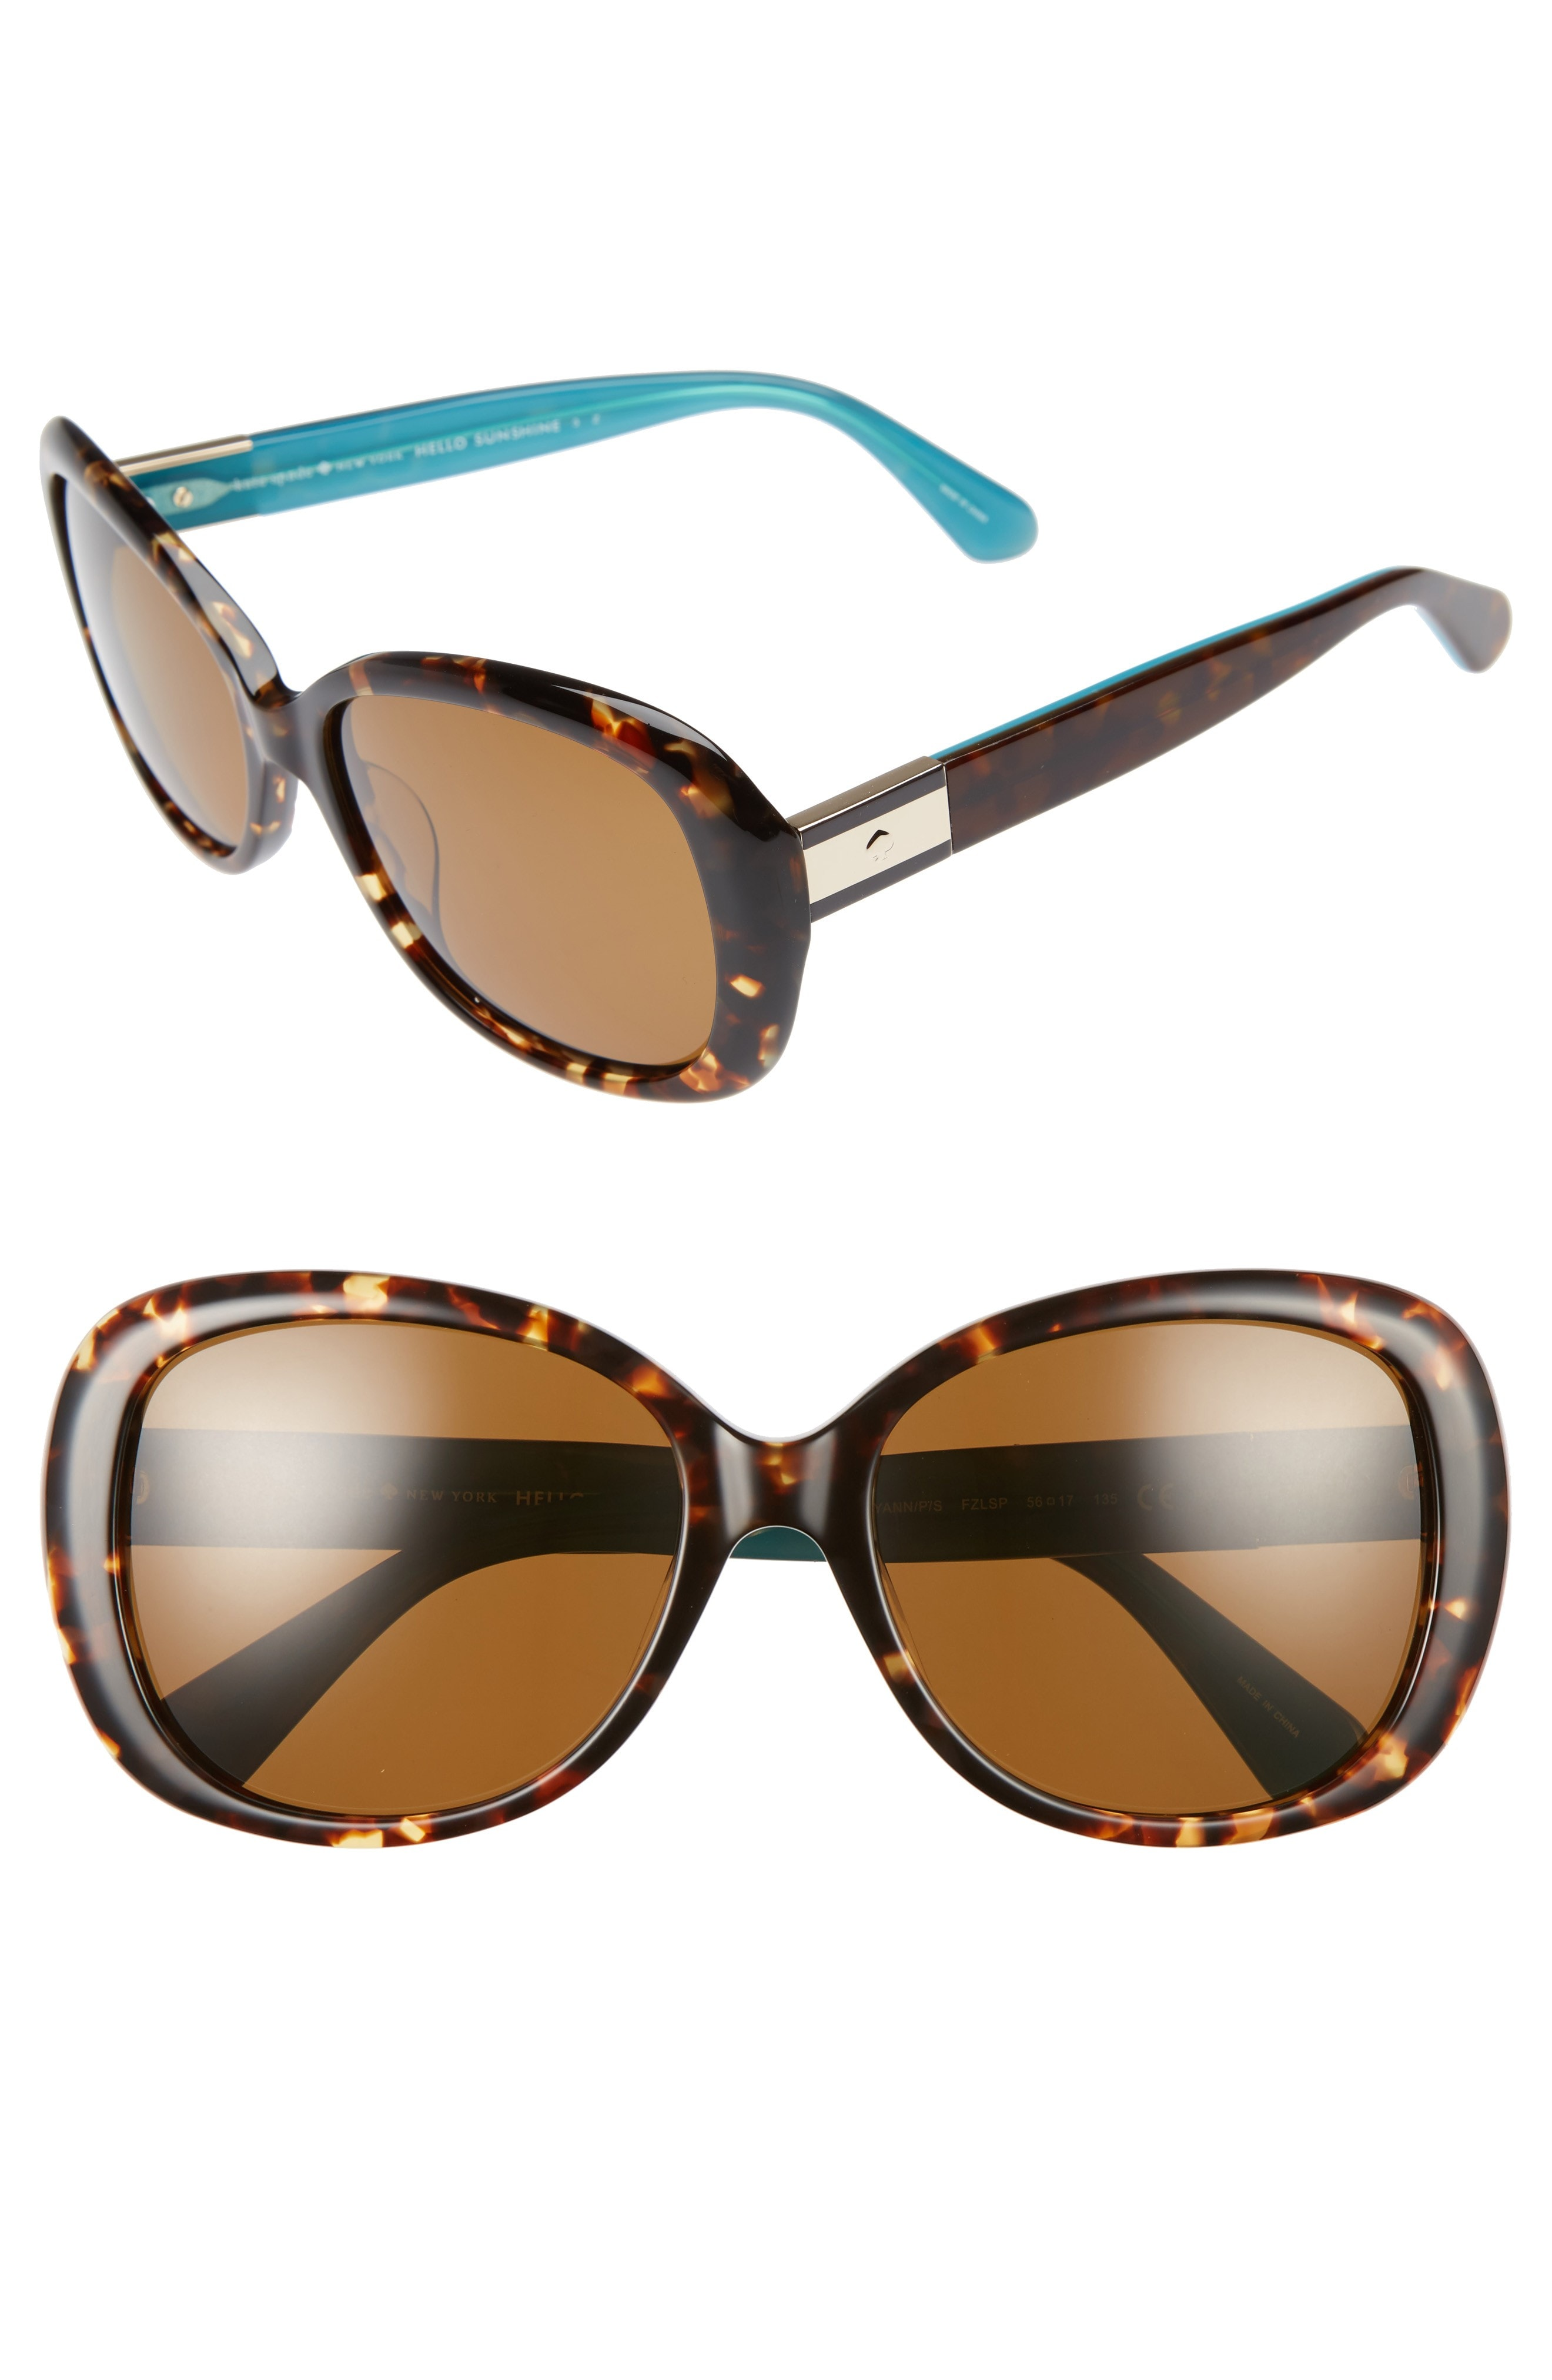 kate spade new york judyann 56mm polarized sunglasses